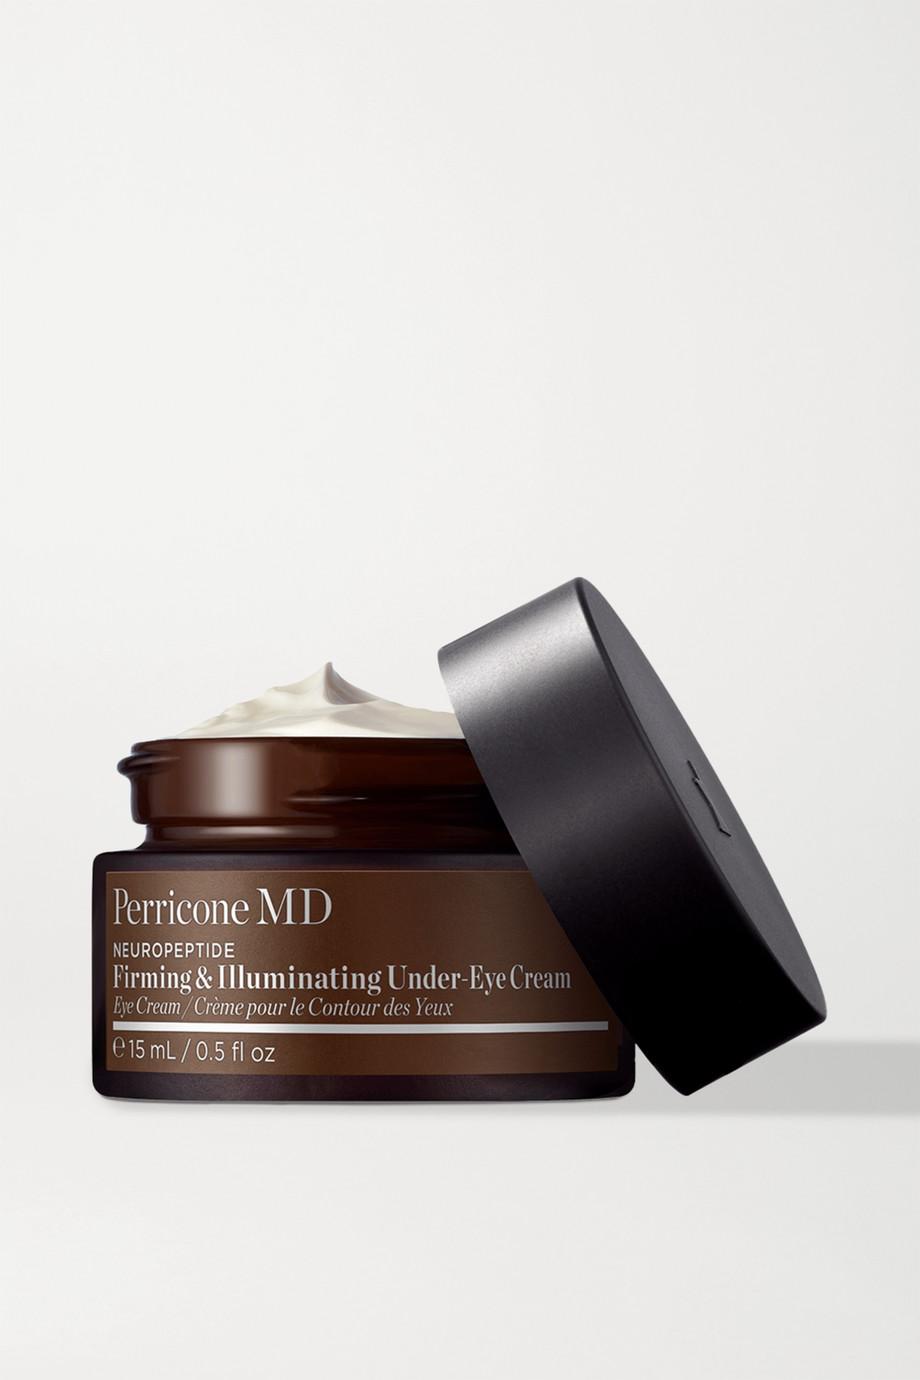 Perricone MD Neuropeptide Firming and Illuminating Under-Eye Cream, 15 ml – Augencreme